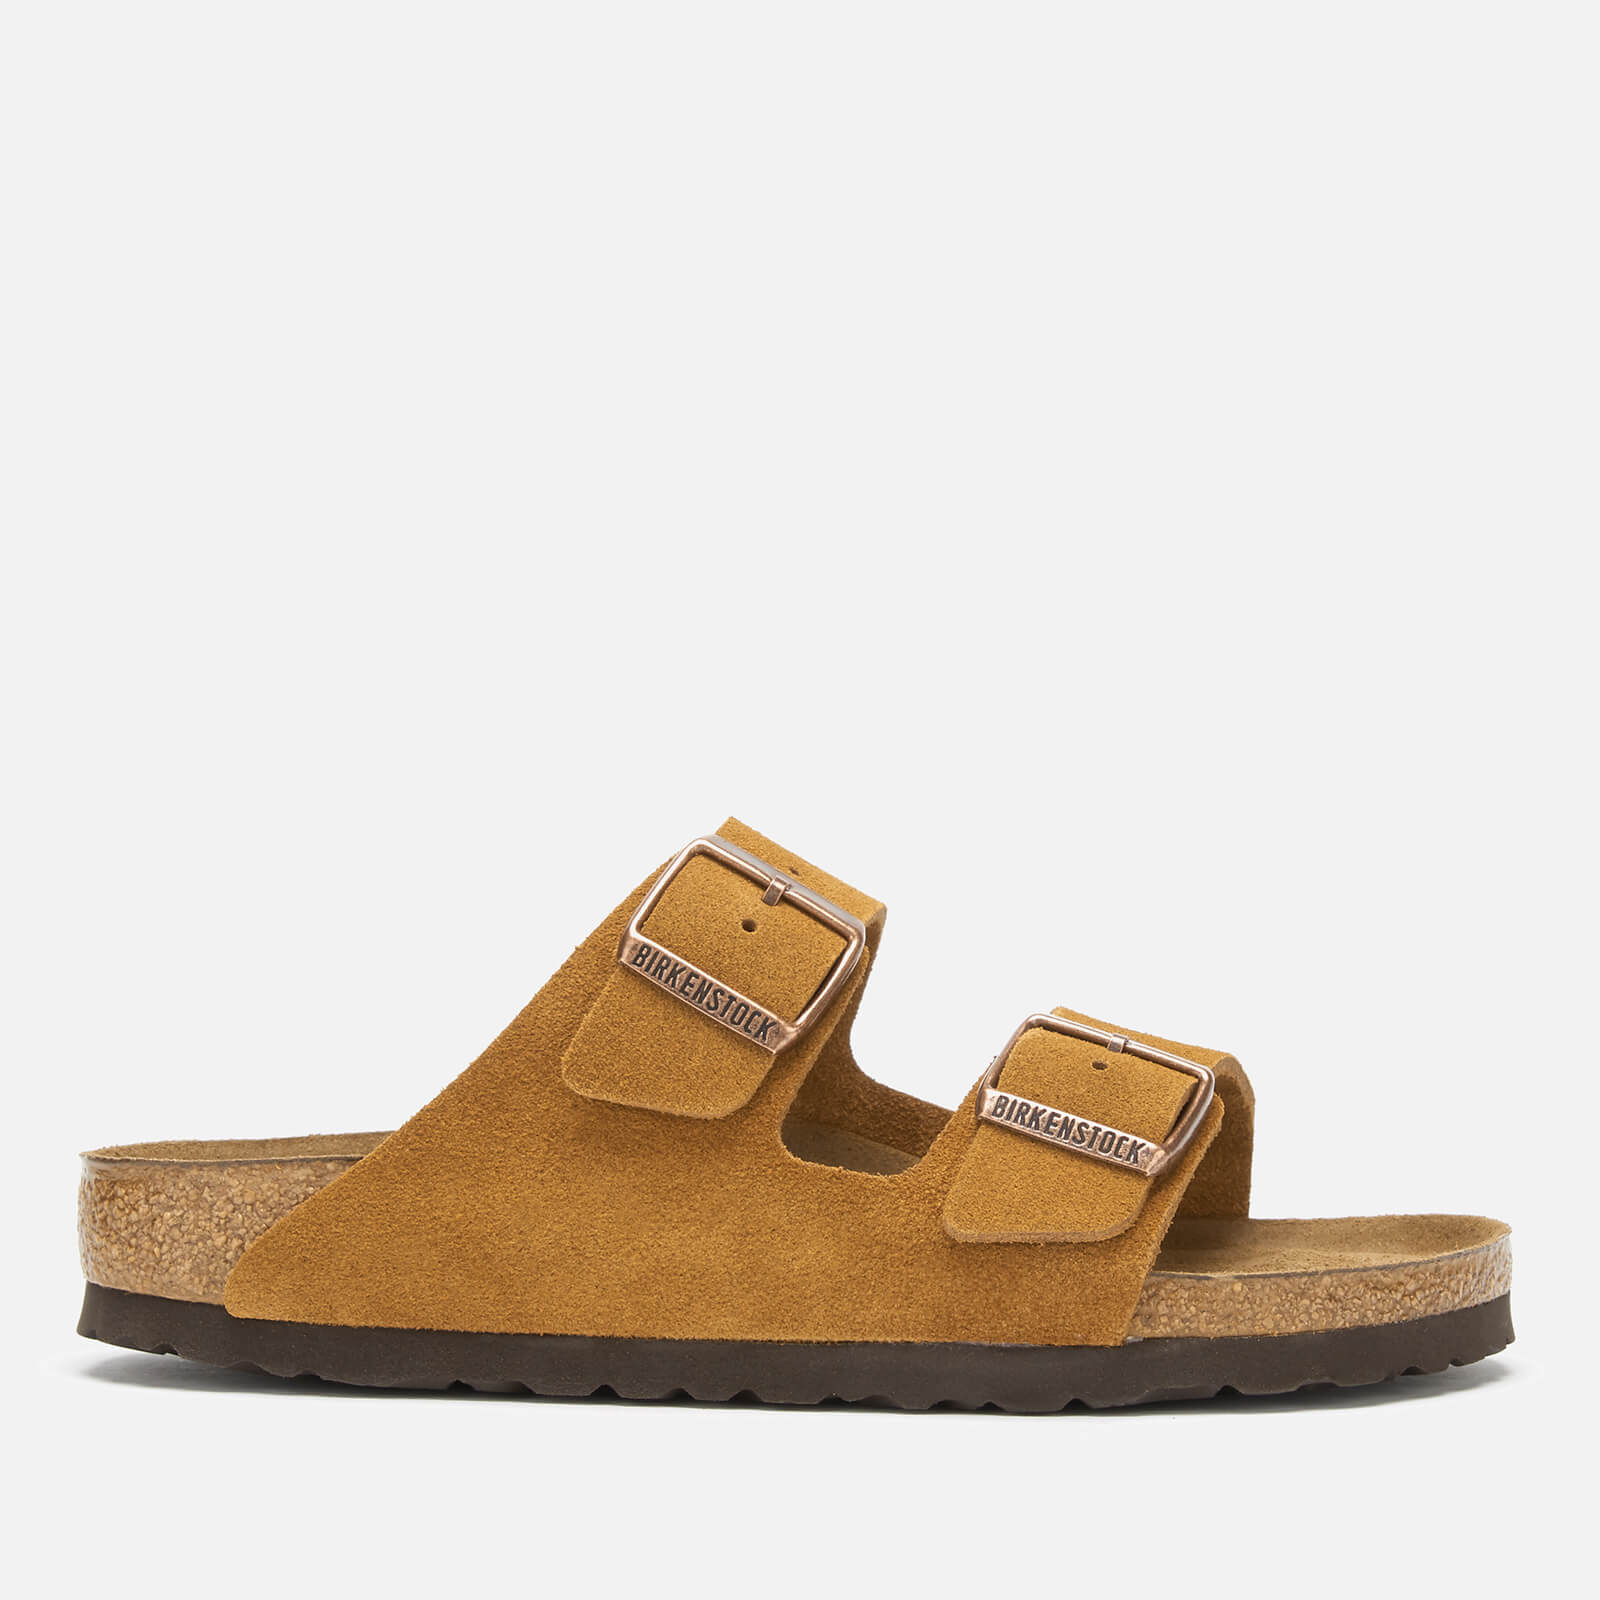 Birkenstock Women's Arizona Slim Fit Sfb Suede Double Strap Sandals - Mink - Eu 36/Uk 3.5